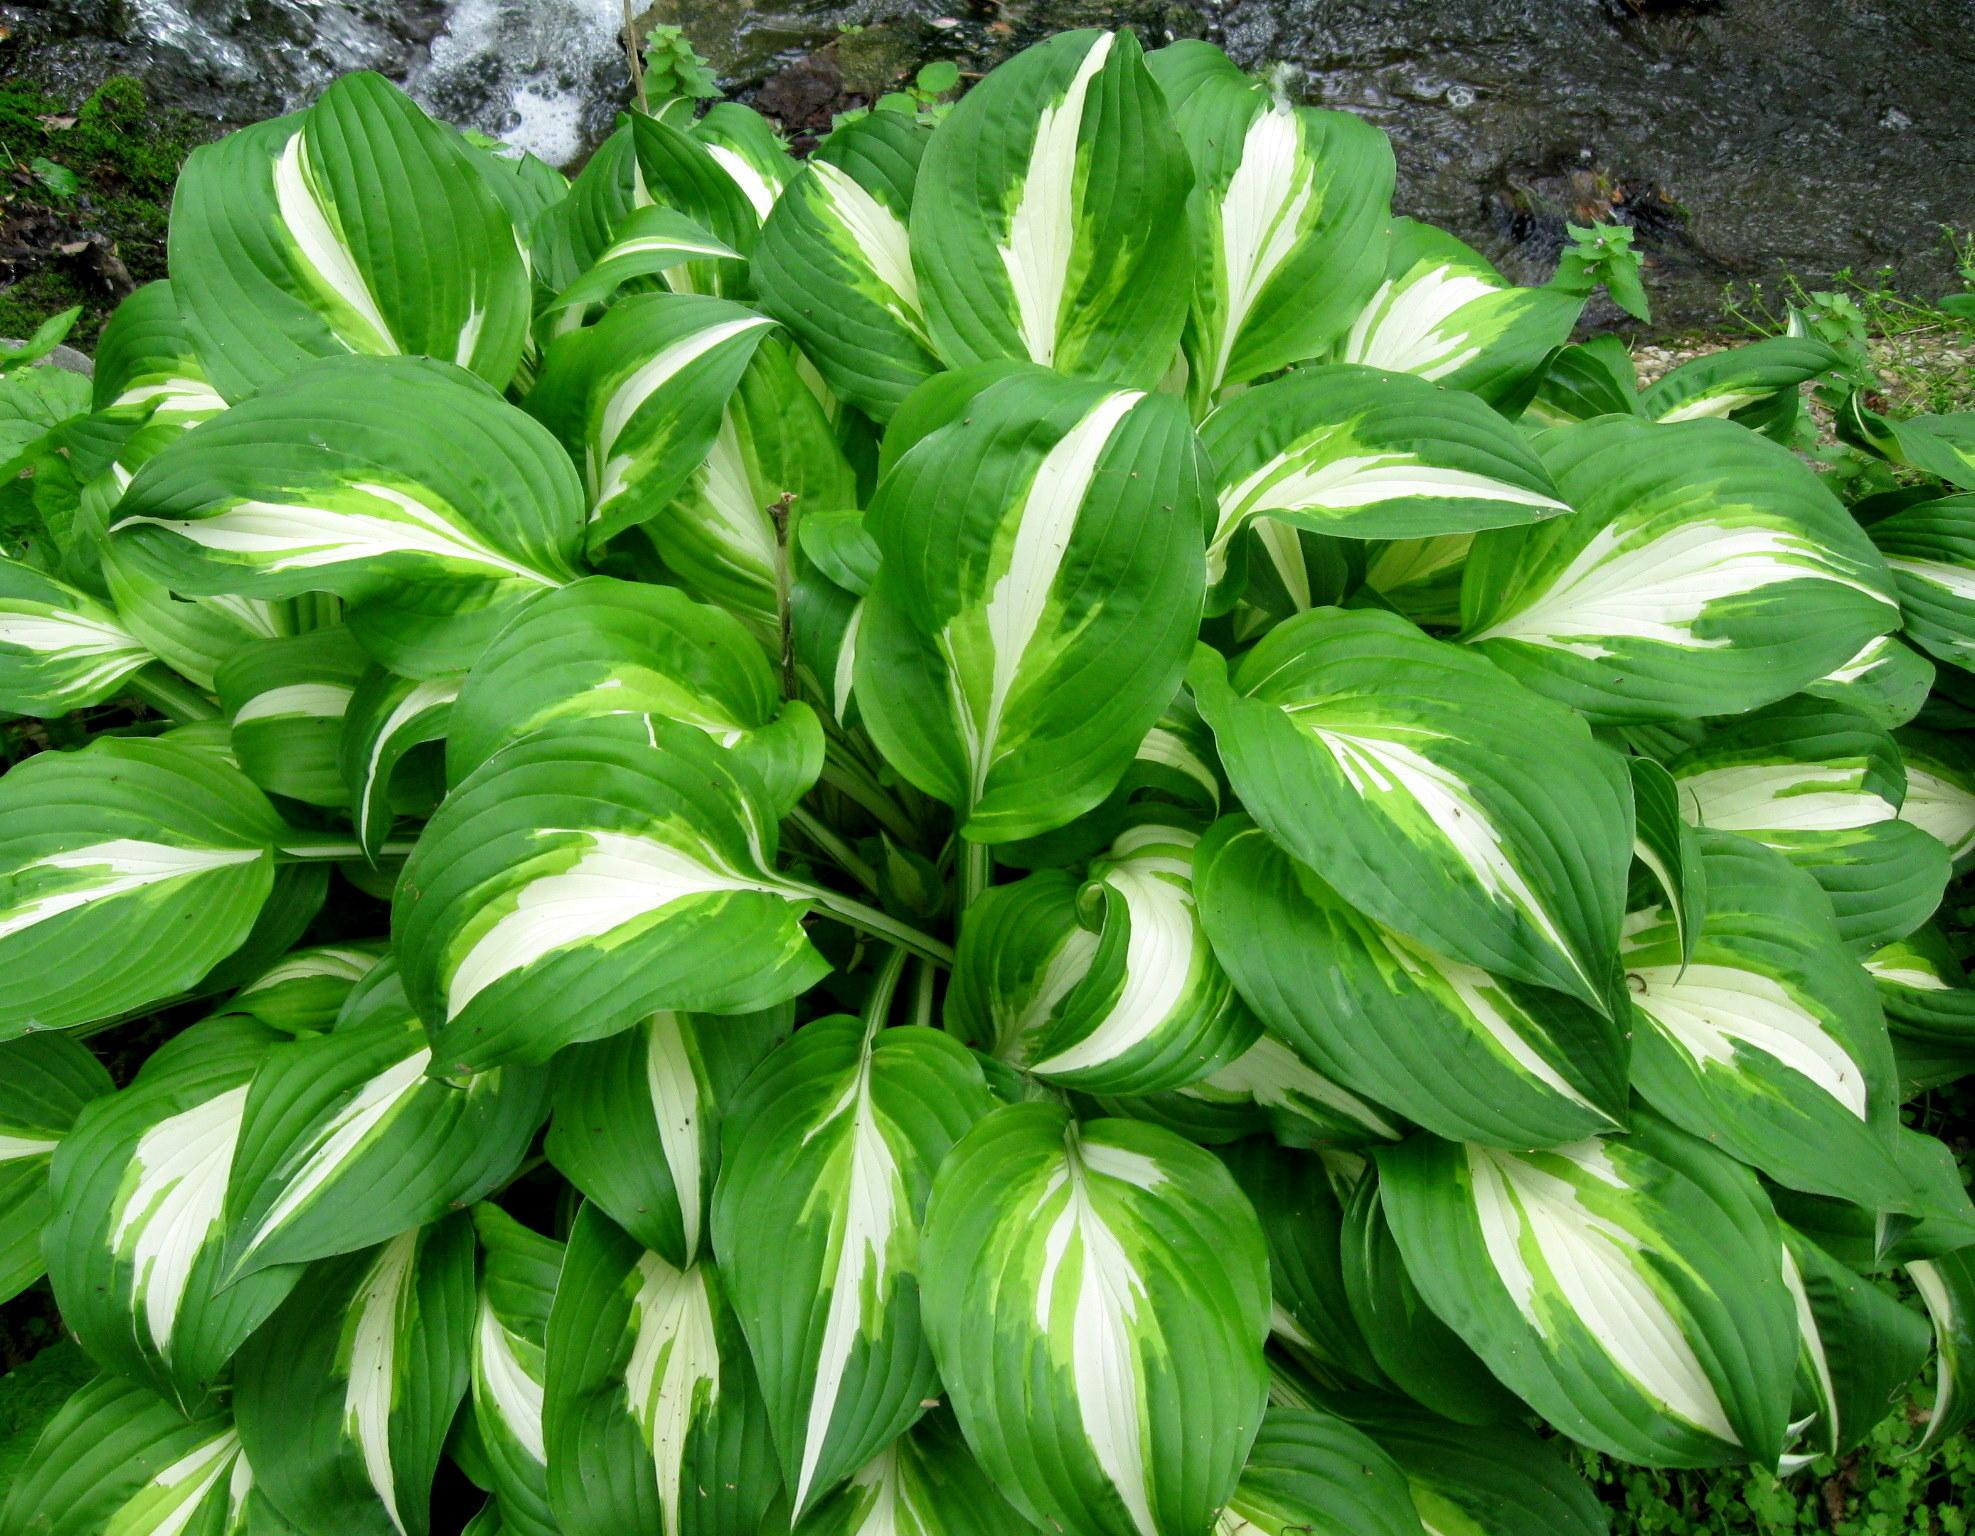 Ground Cover Plants For Sun Drought Tolerant Lawn Alternative